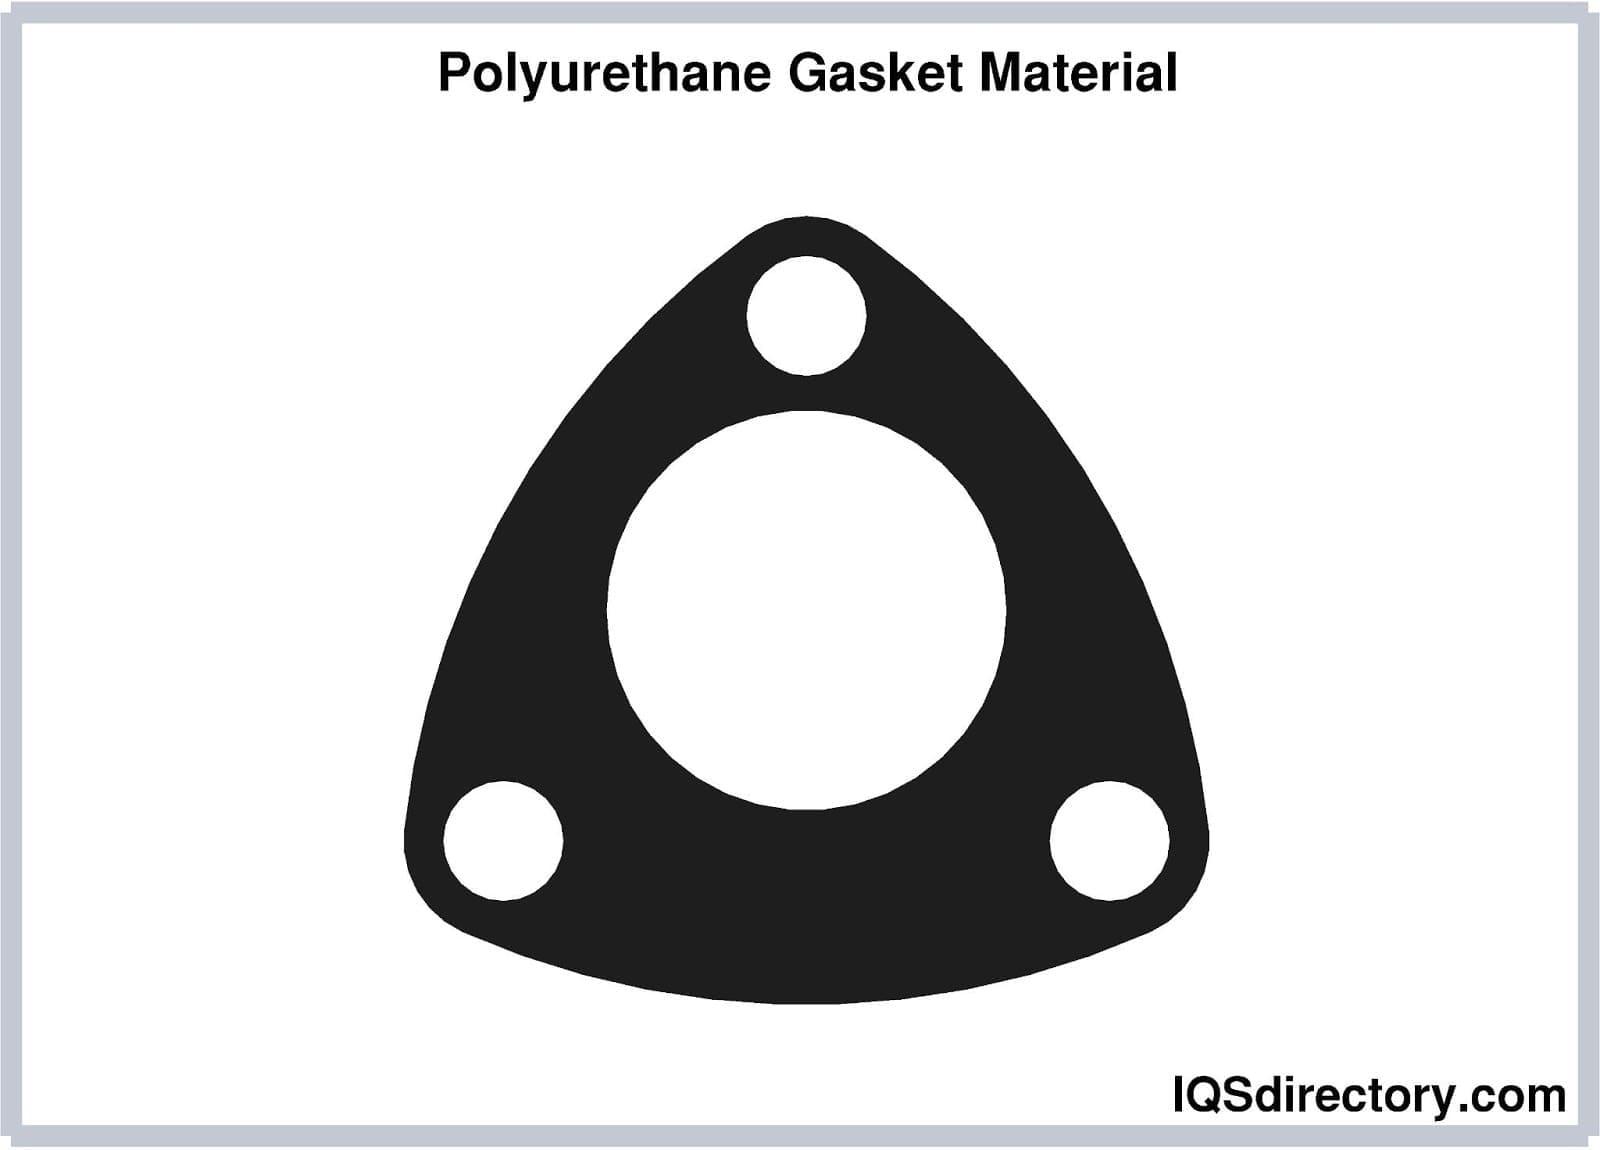 Polyurethane Gasket Material